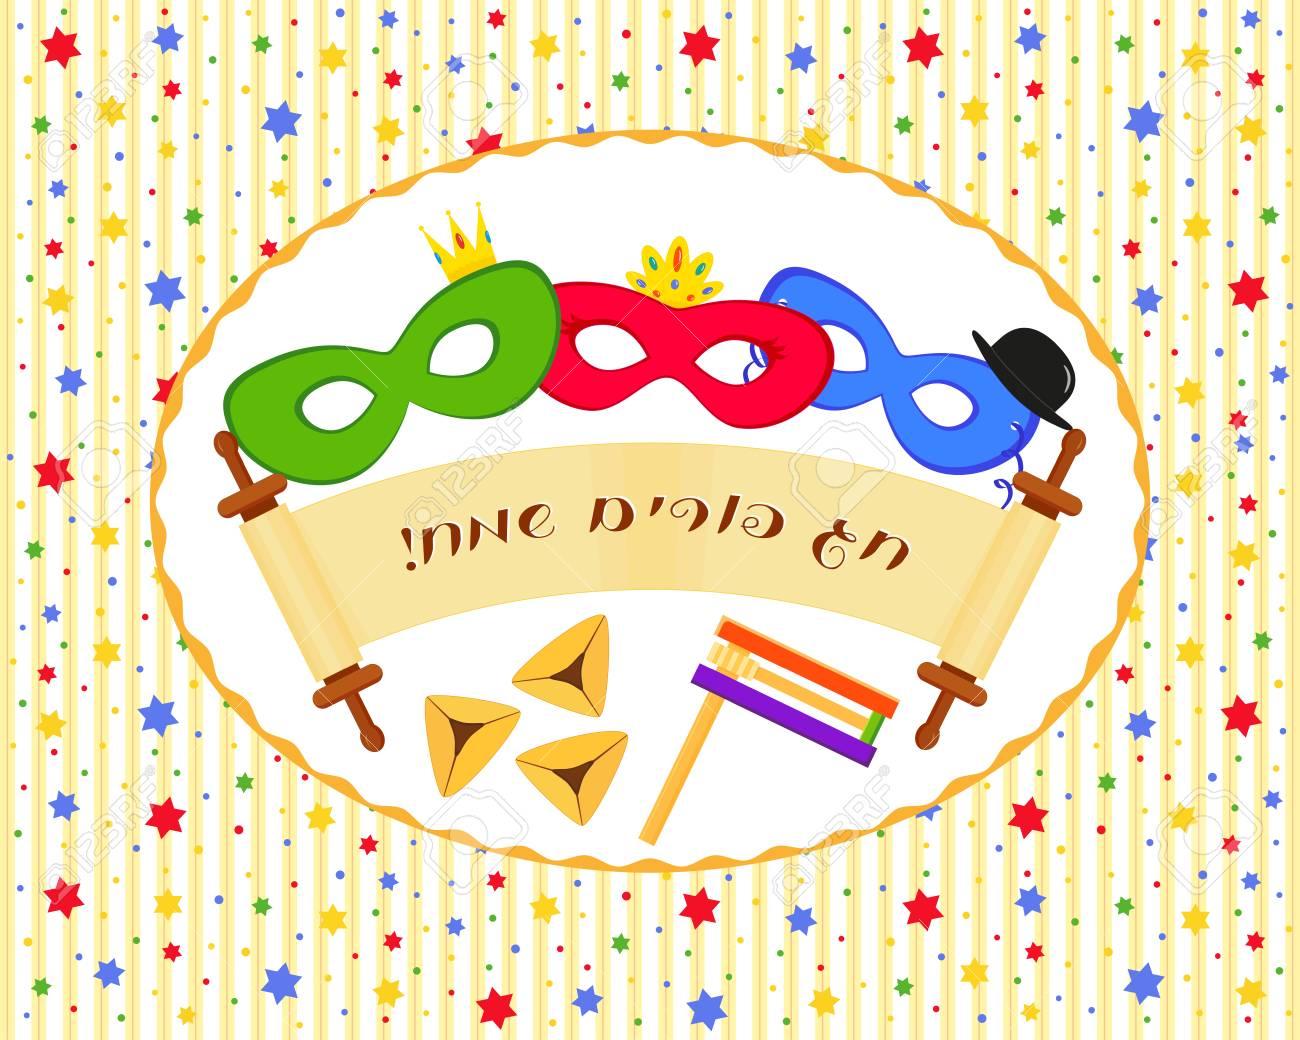 Jewish holiday of purim carnival masks scroll with greeting jewish holiday of purim carnival masks scroll with greeting inscription hebrew happy purim m4hsunfo